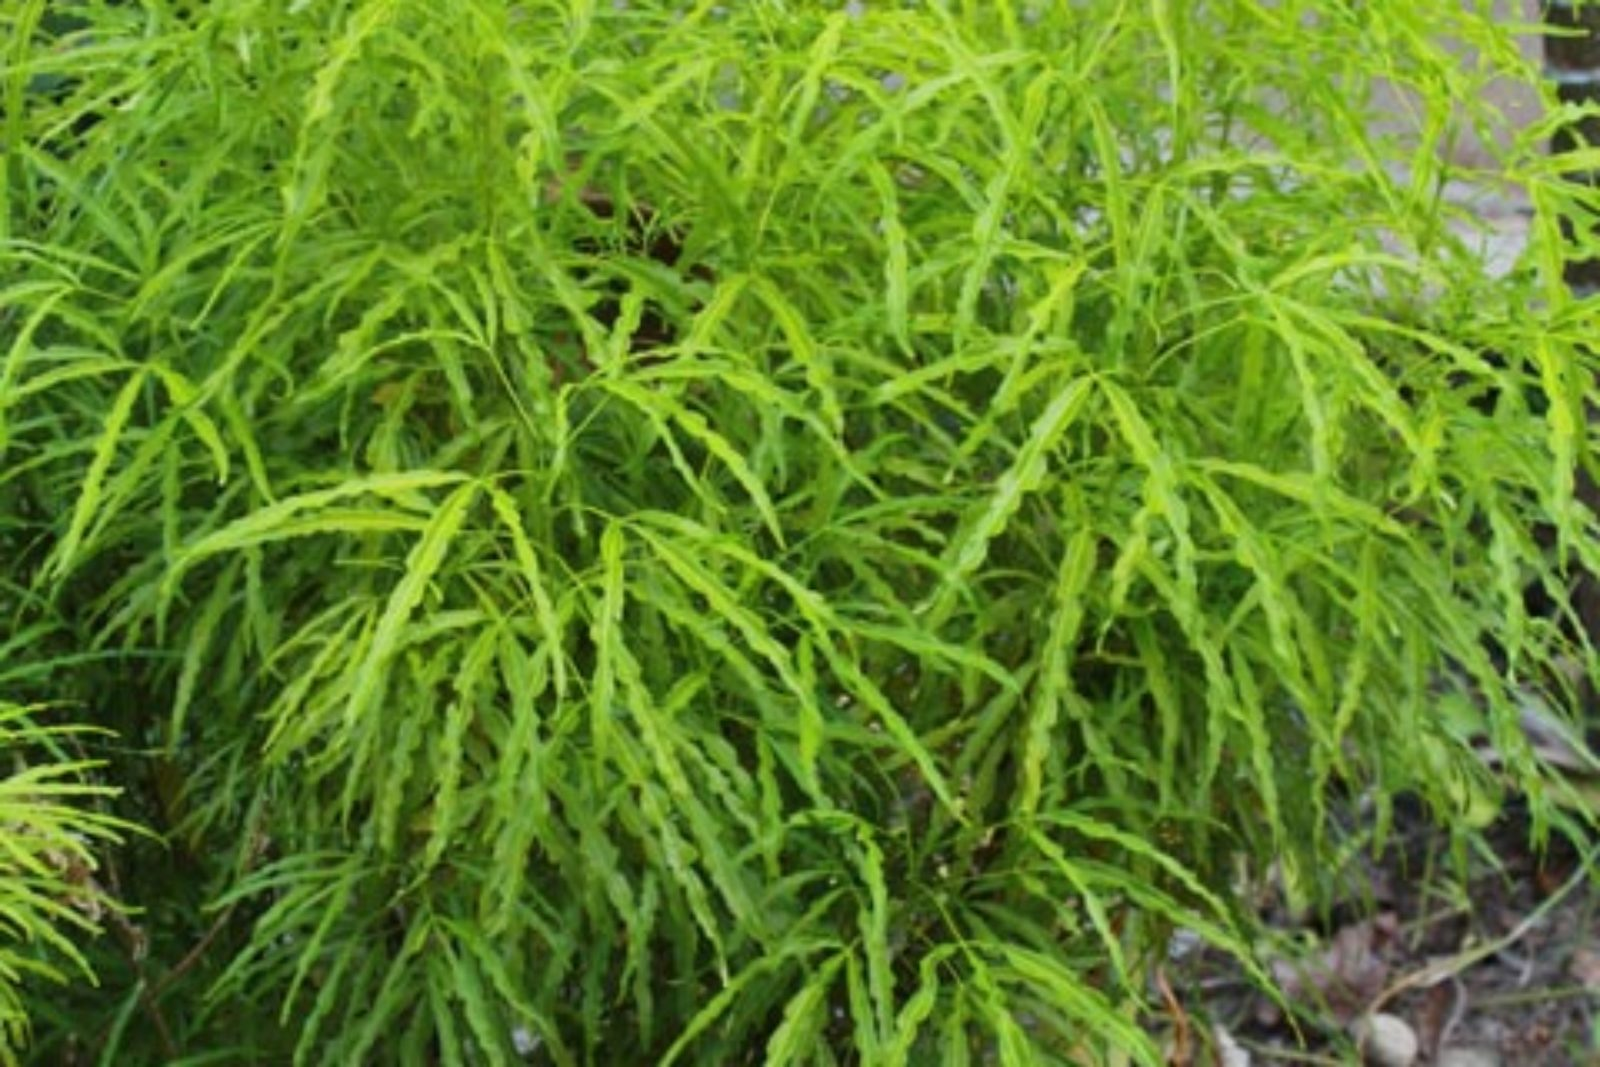 Melicope denhamii